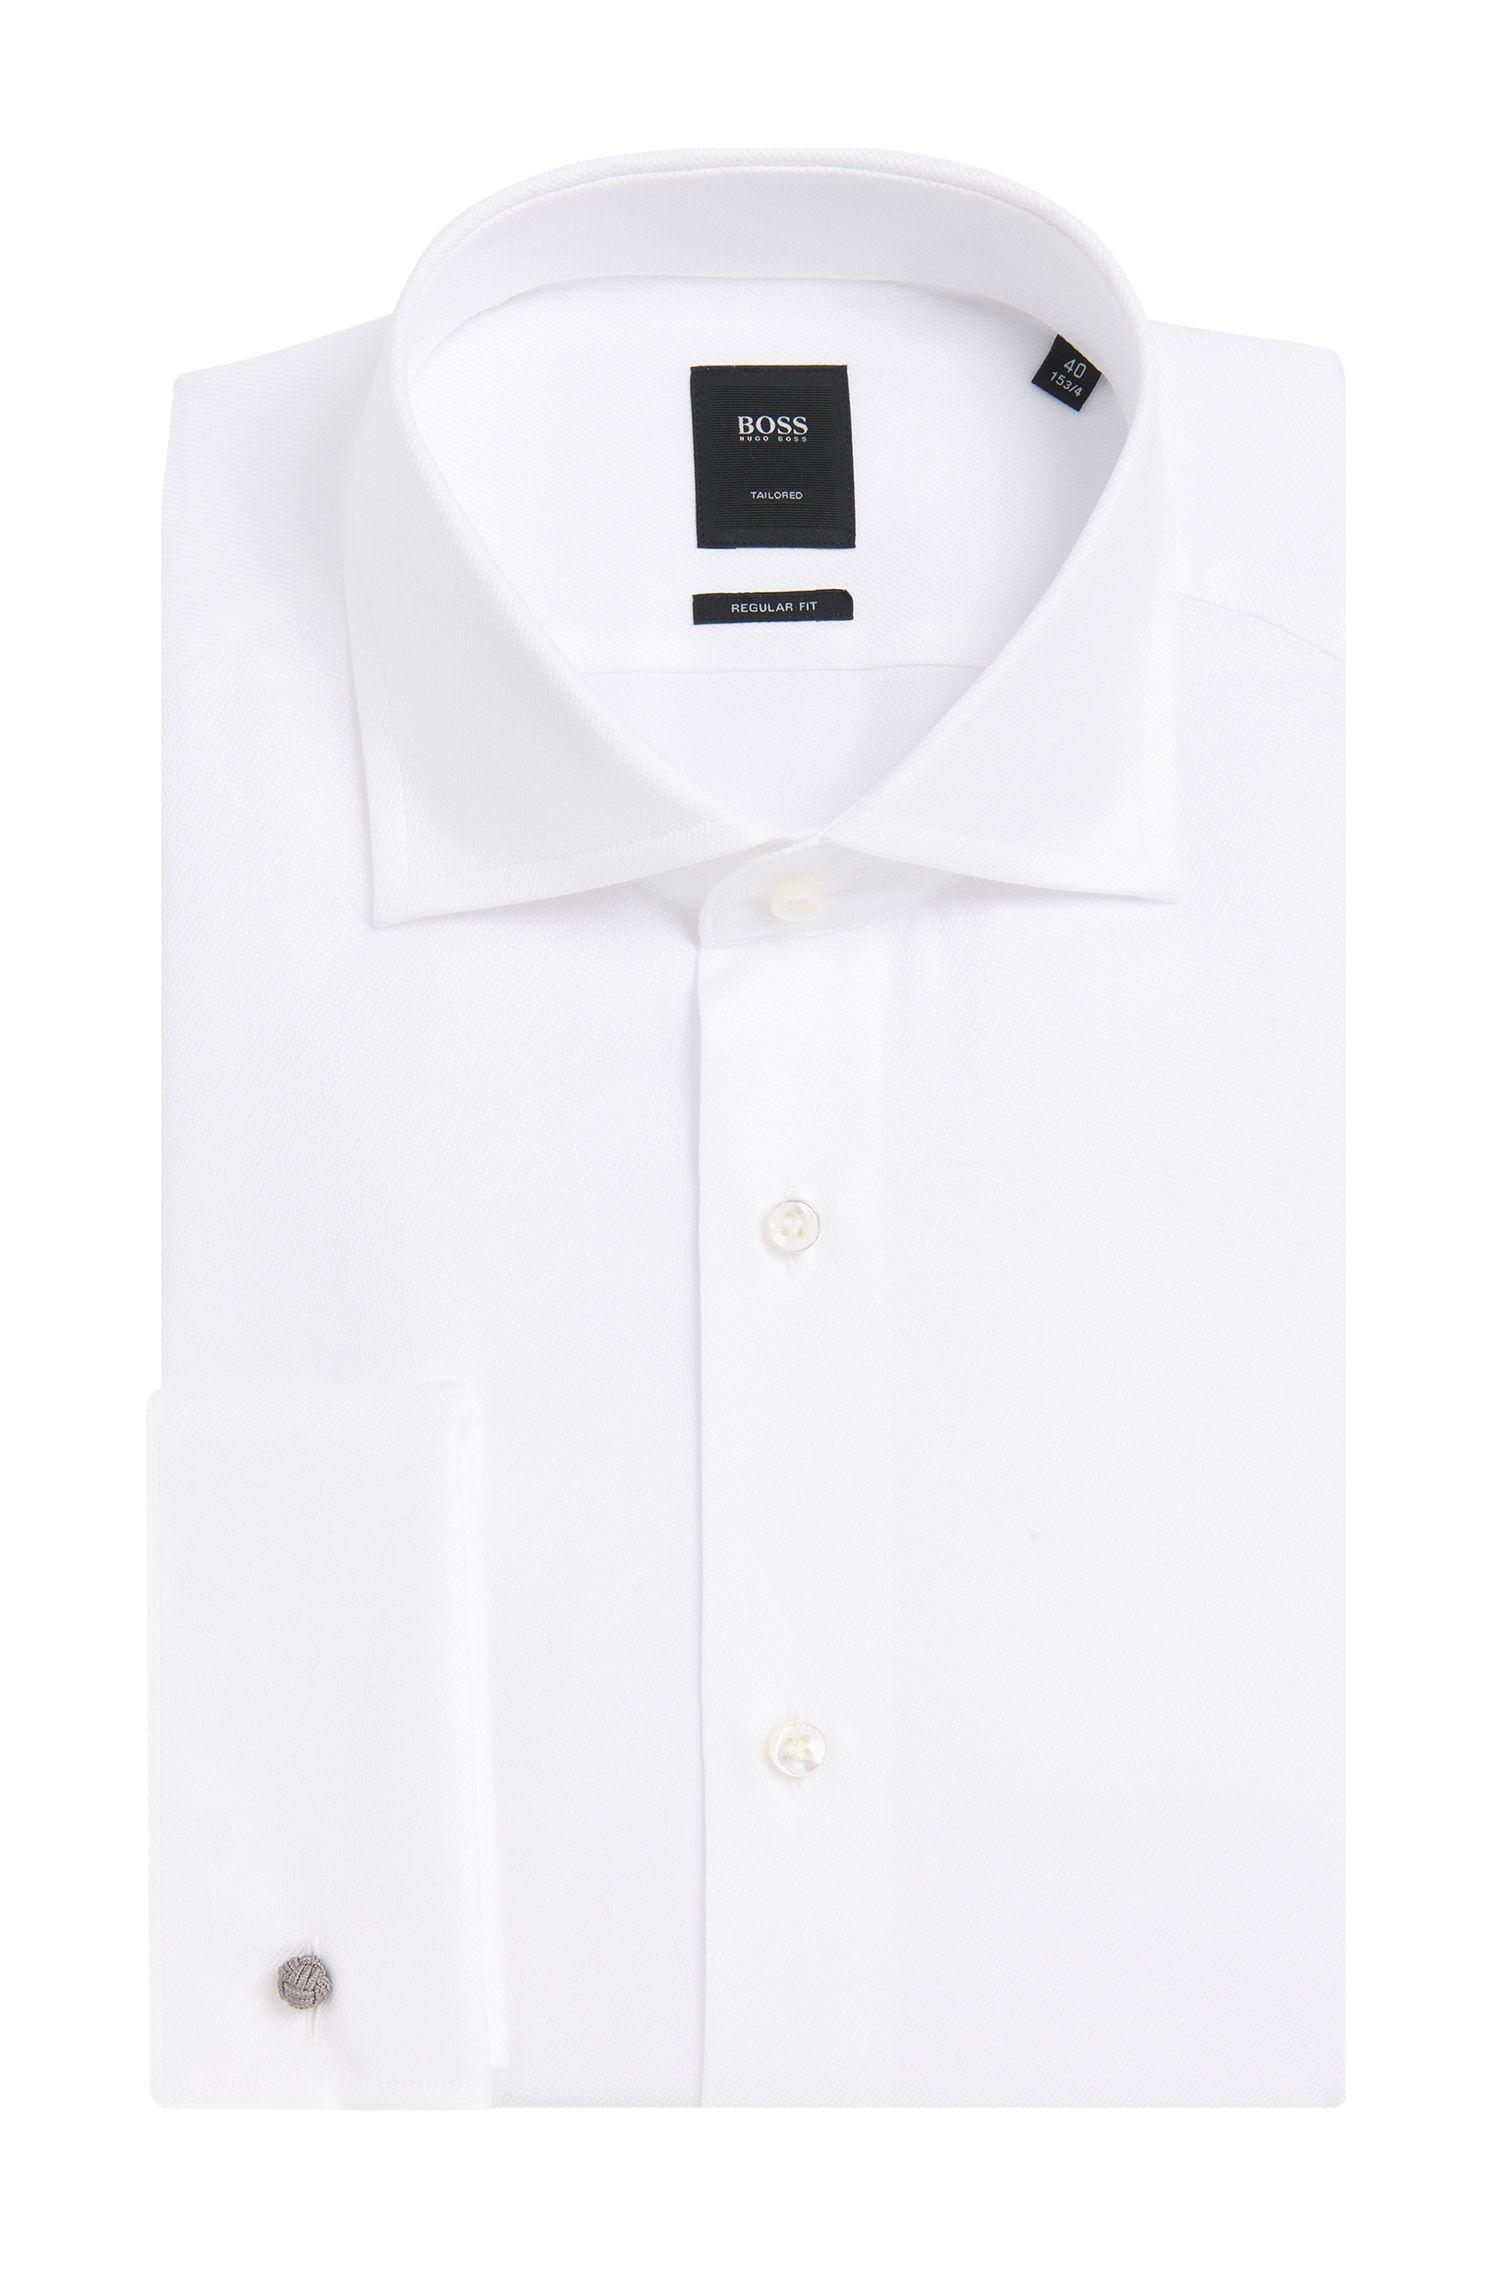 'T-Stan' | Slim Fit, Egyptian Cotton French Cuff Dress Shirt